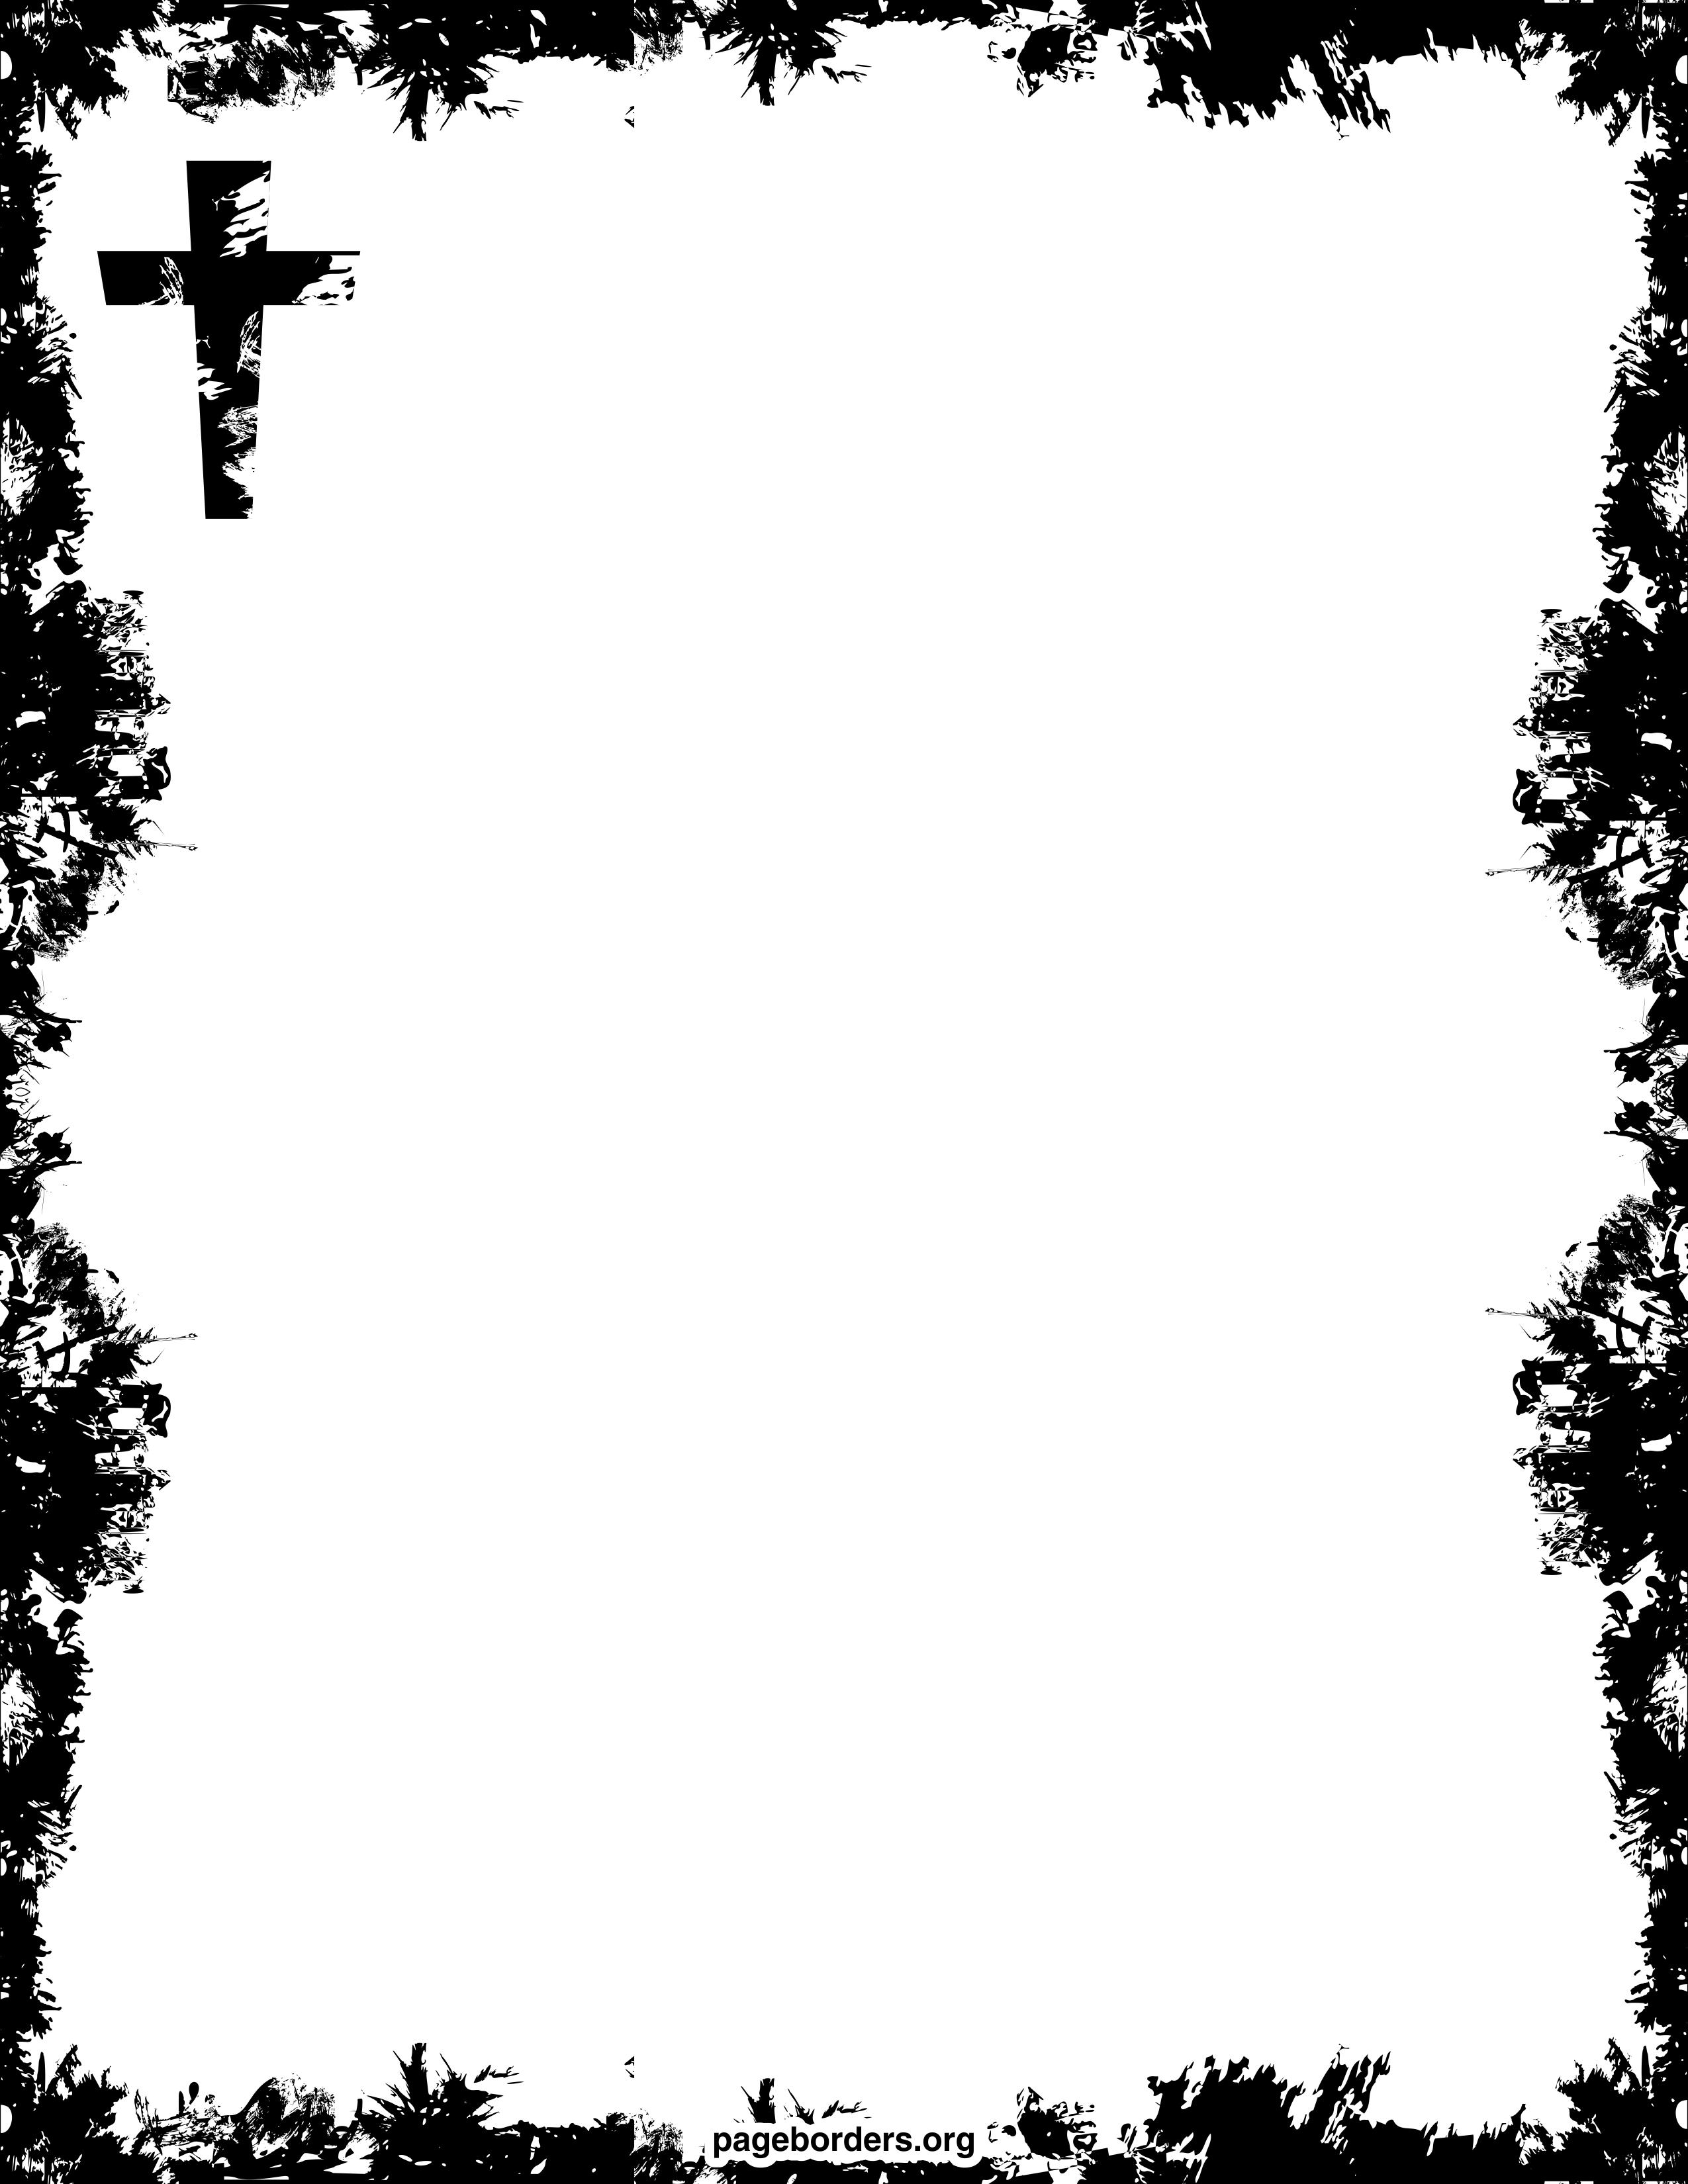 Free Religious Borders Clip Art Page Bor-Free Religious Borders Clip Art Page Borders And Vector Graphics-1